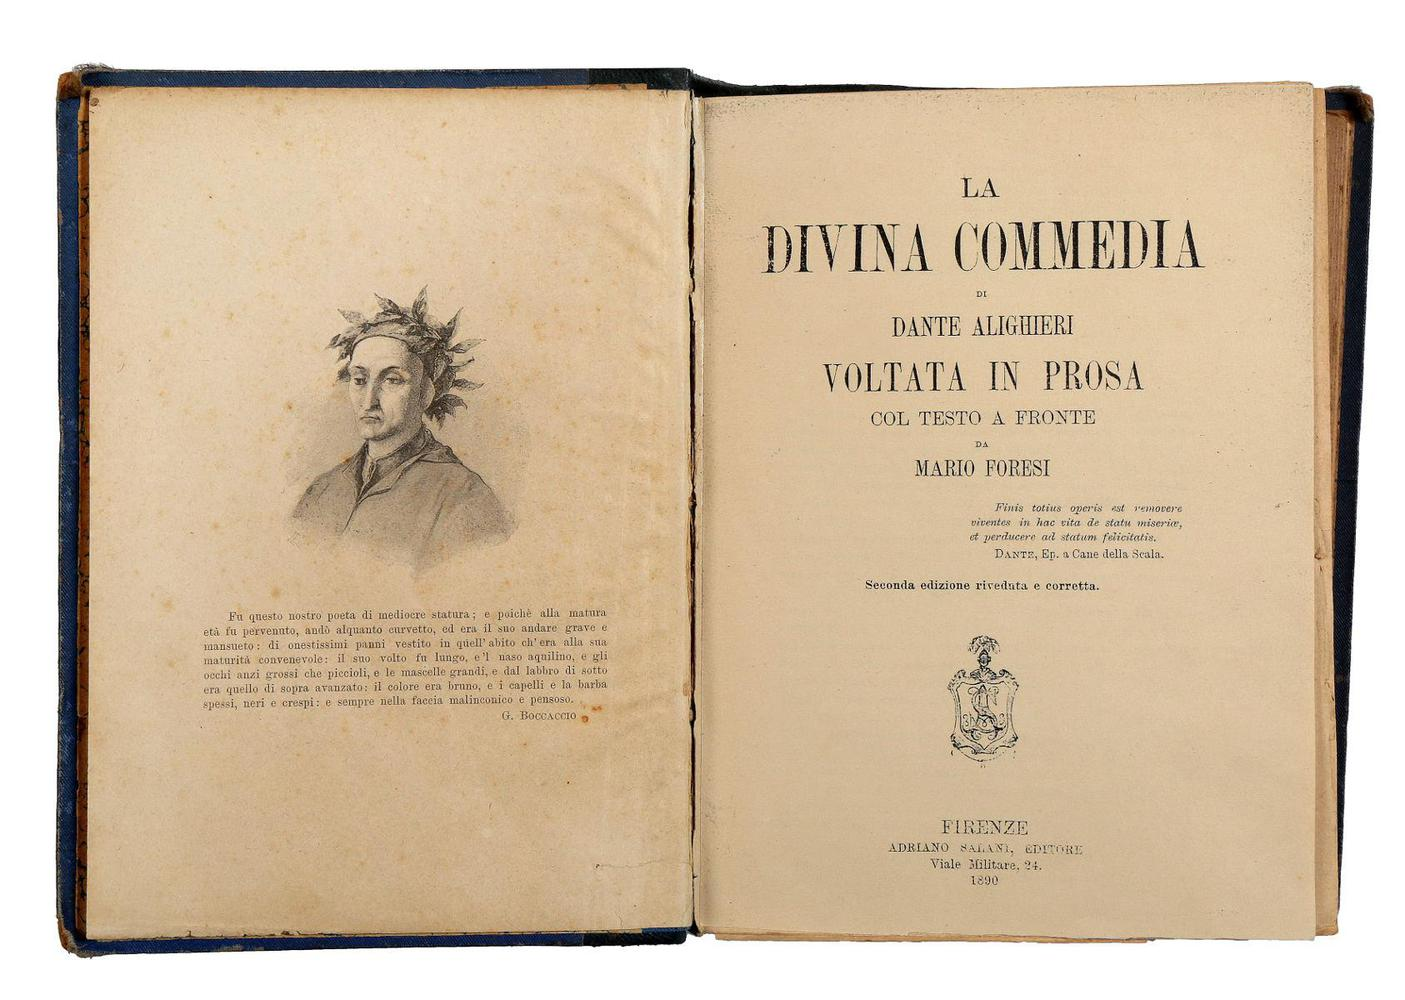 Essay: The Divine Comedy by Dante Alighieri (1265 – 1321)